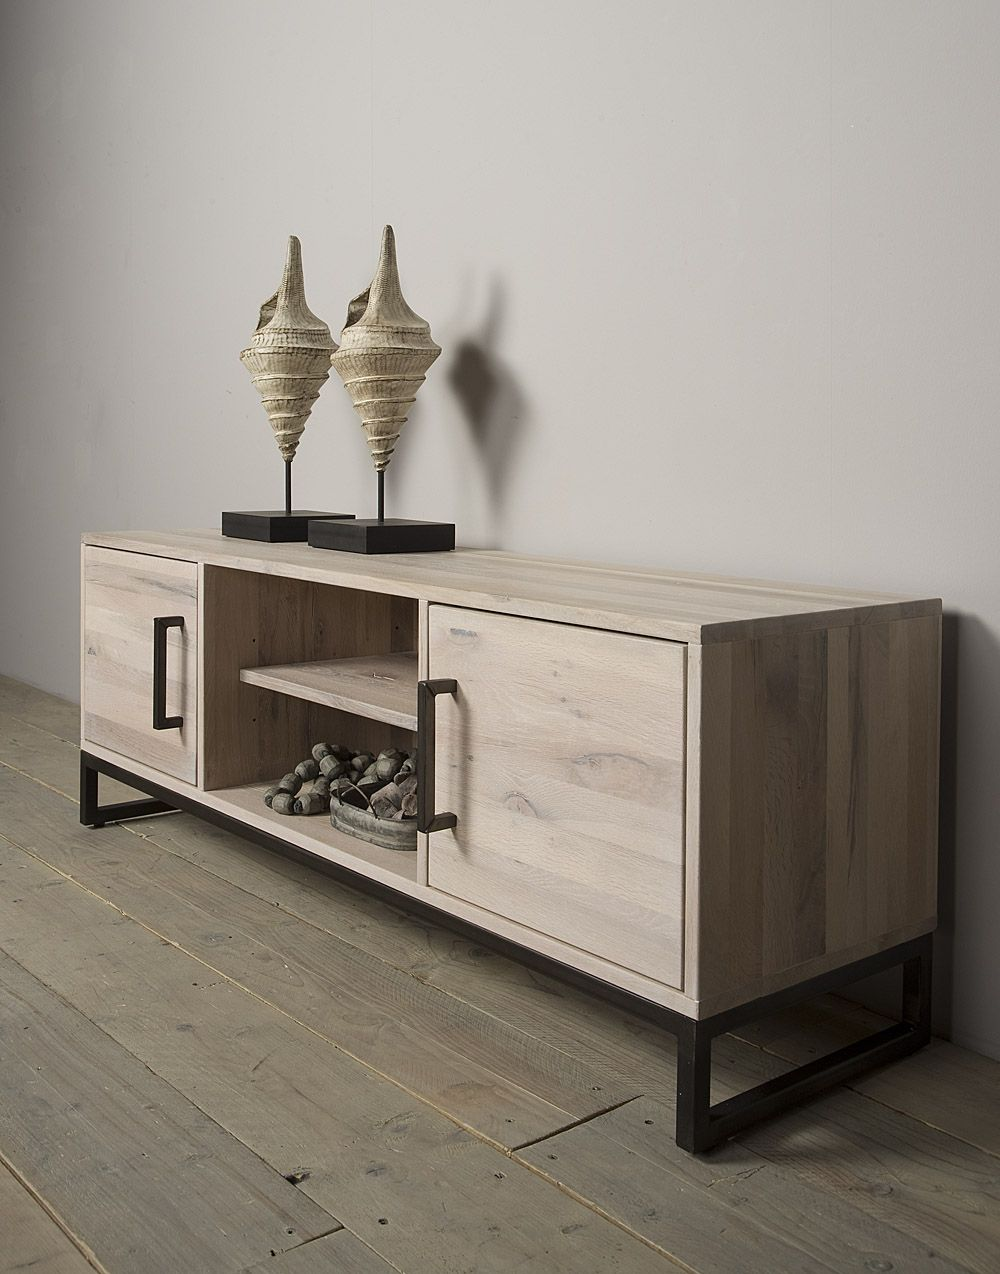 Tv Meubel Licht Eikenhout.Lodge Tv Meubel Eikenhout Met Staal 150 Cm Furniture Decor